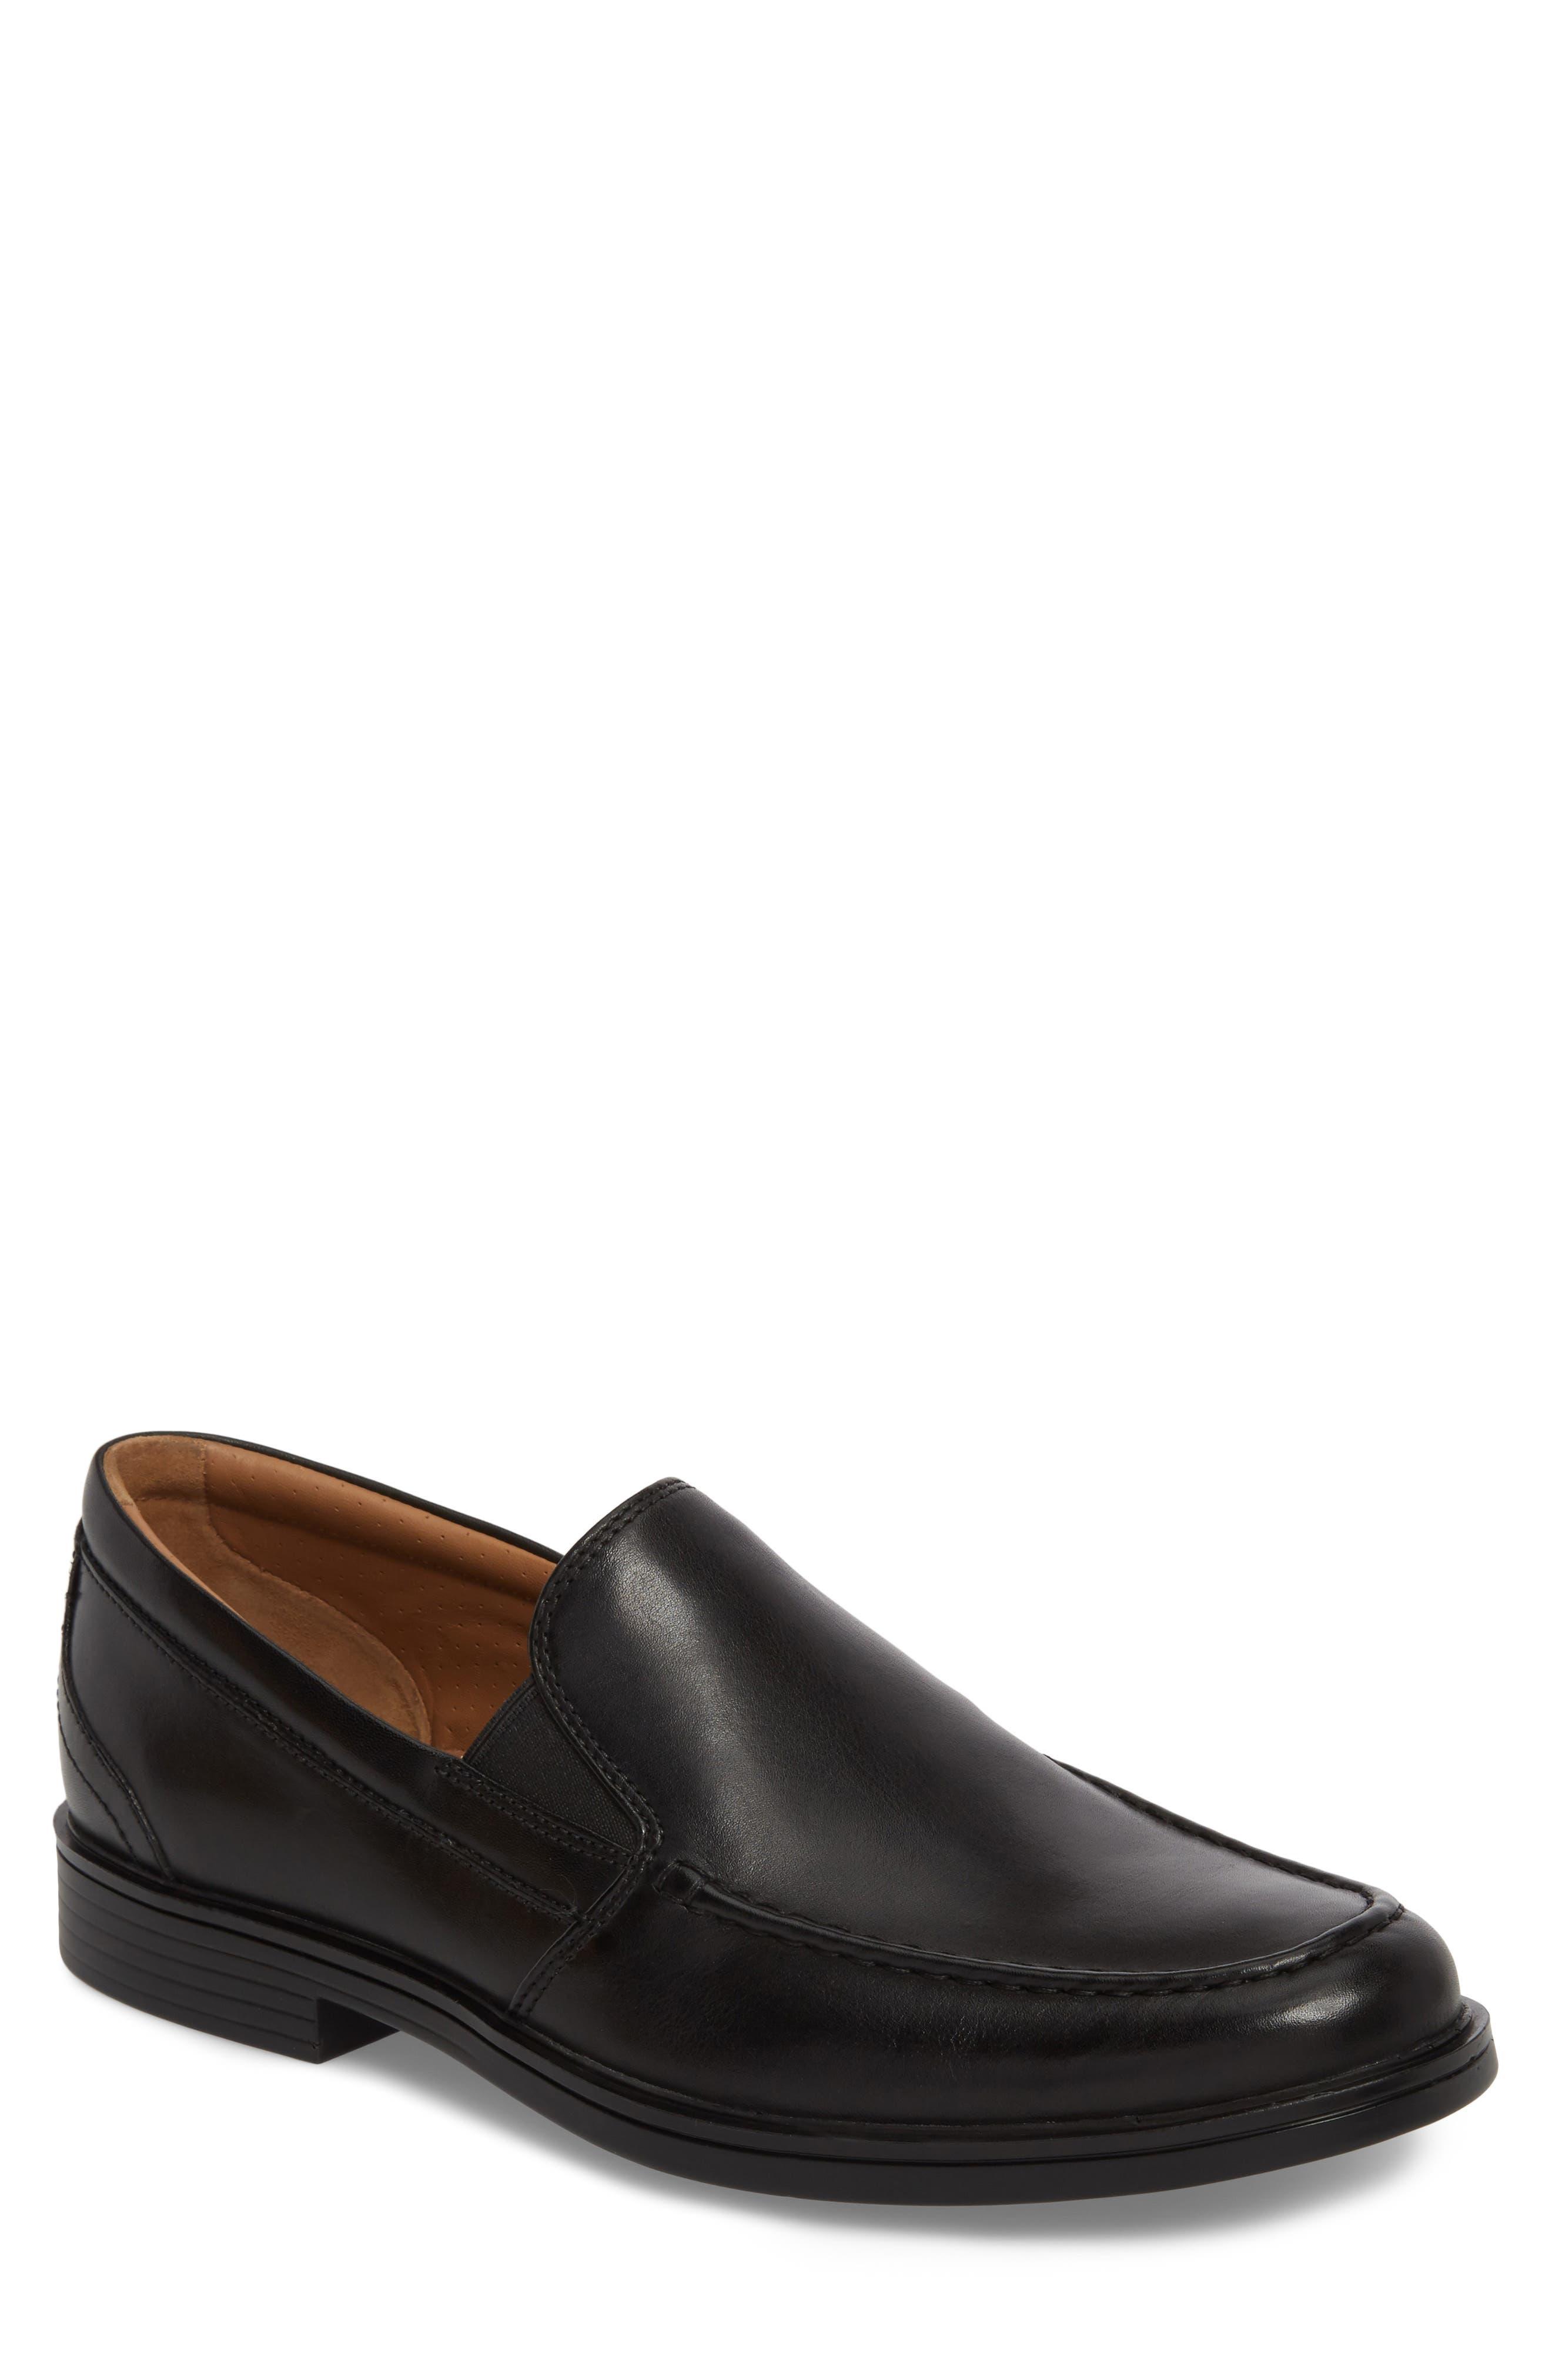 Unaldric Apron Toe Loafer,                         Main,                         color, Black Leather